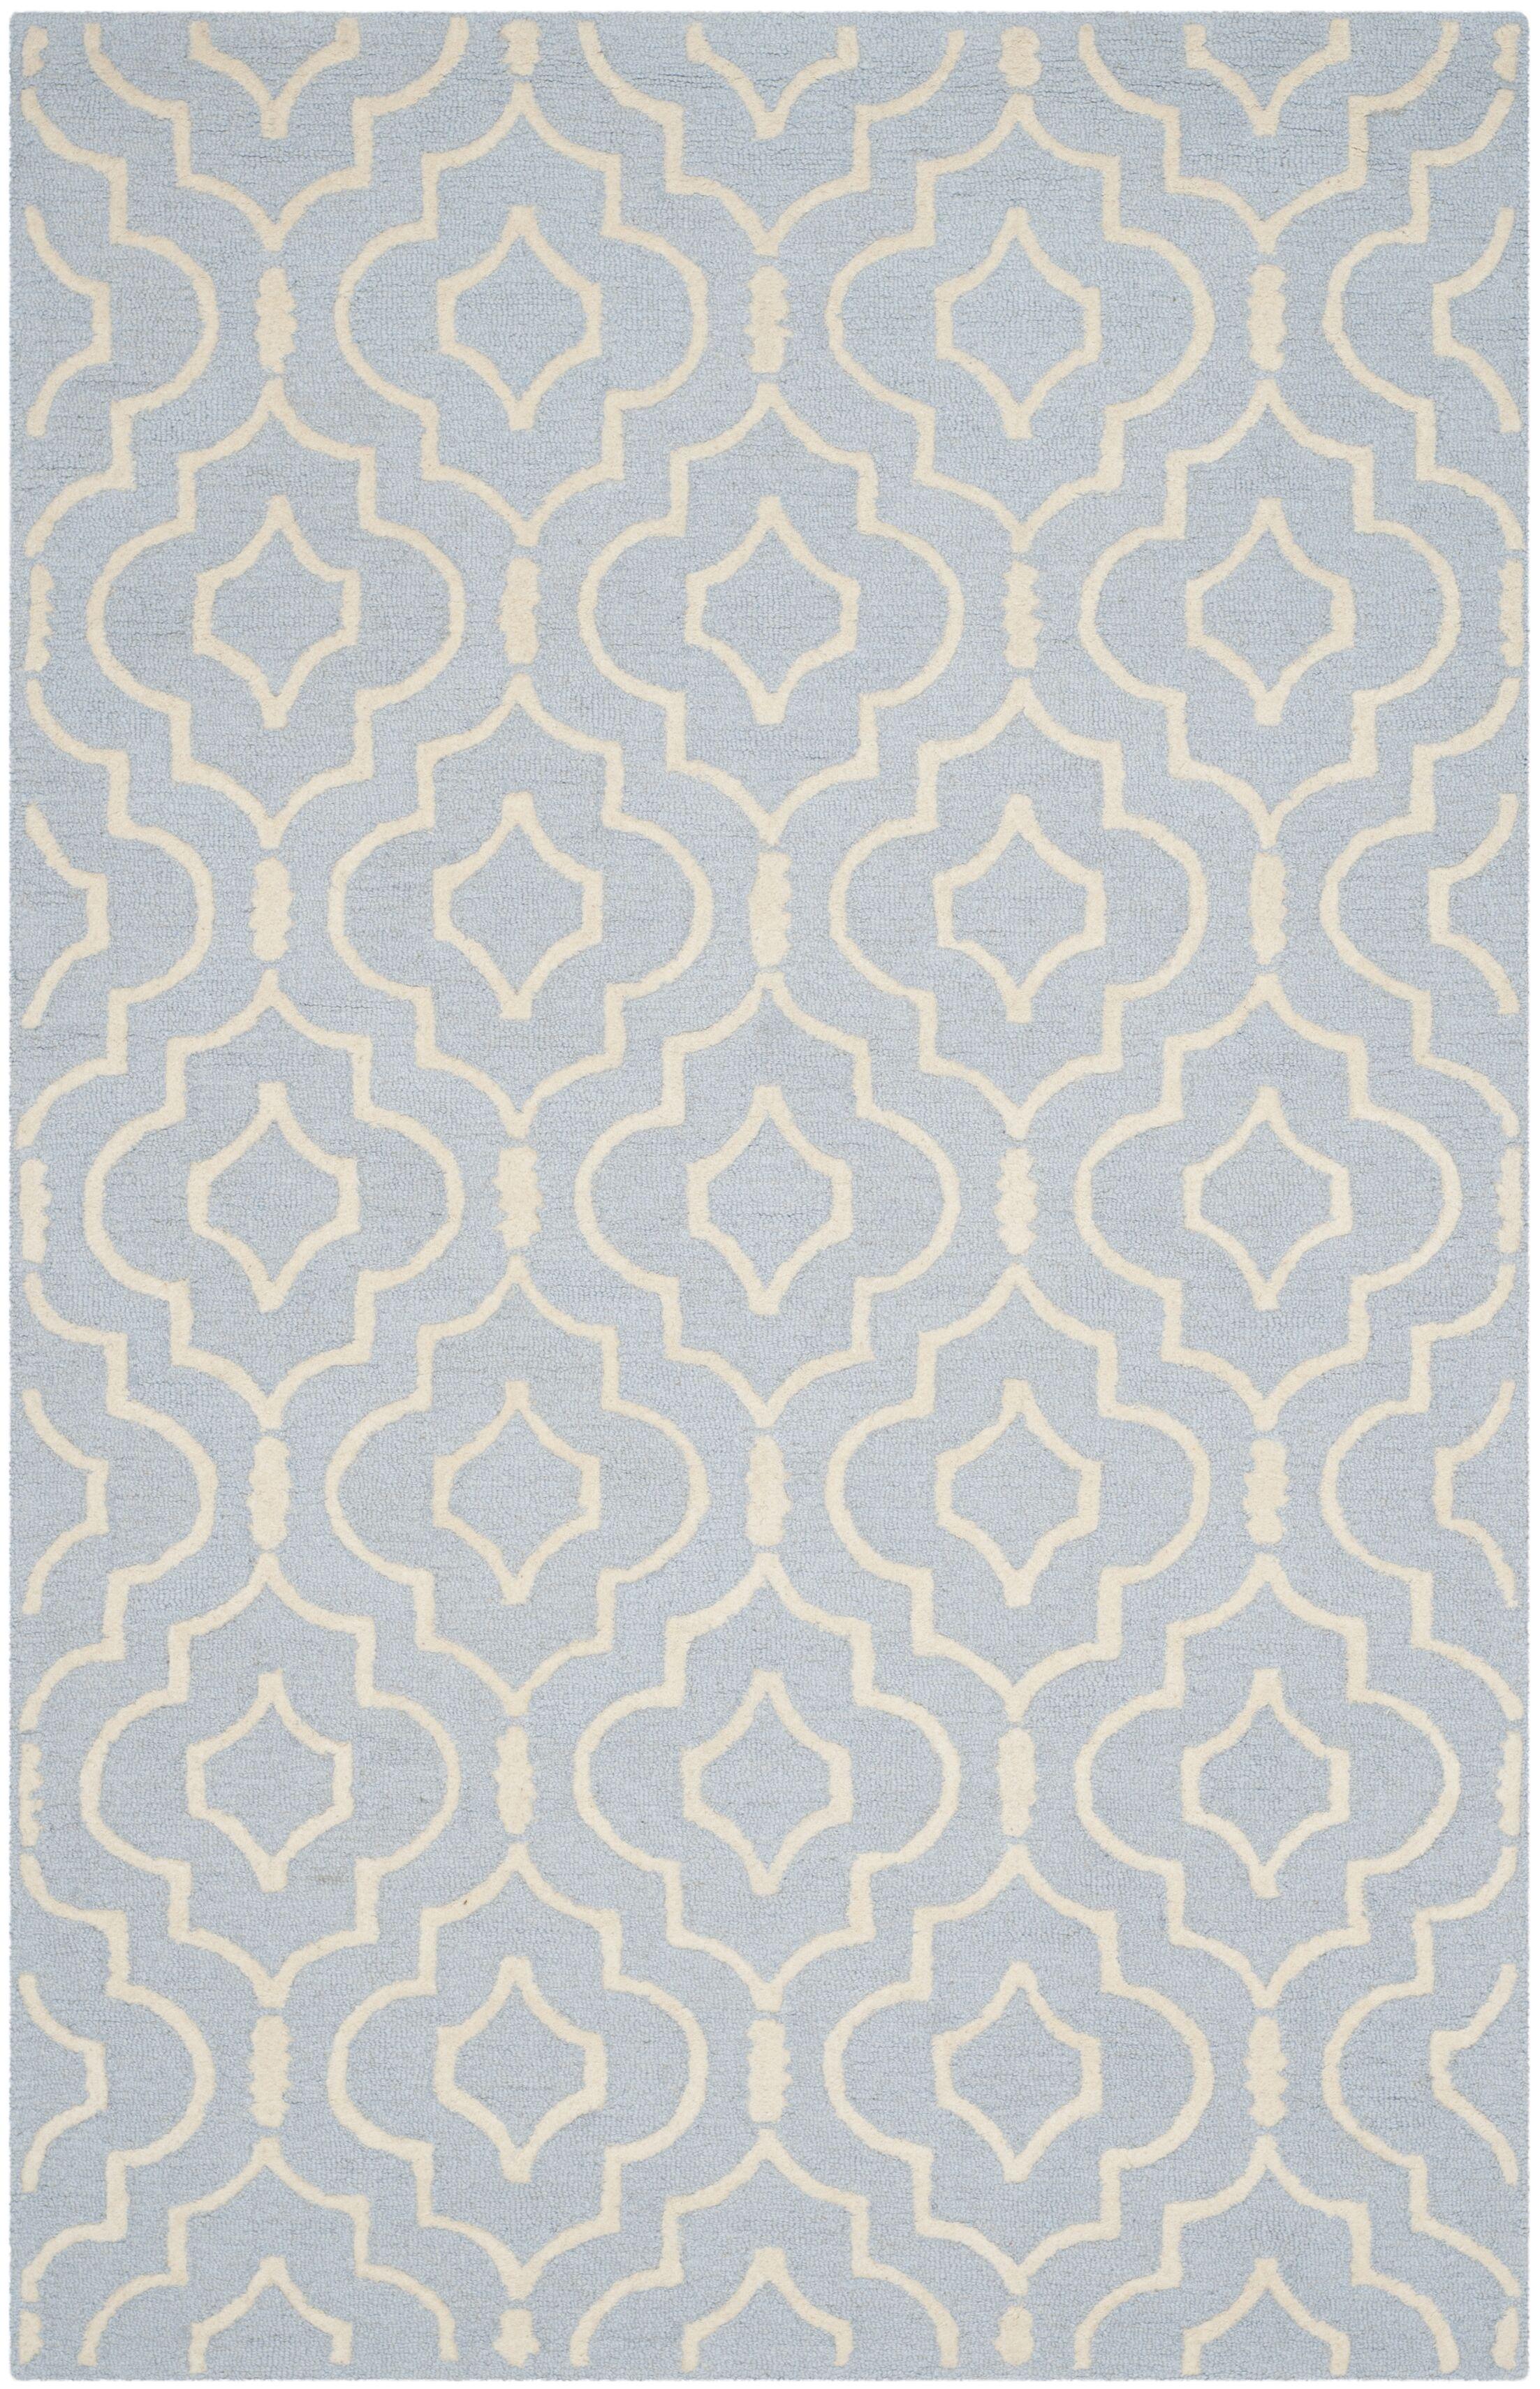 Martins Hand-Tufted Light Blue/Ivory Area Rug Rug Size: Rectangle 4' x 6'